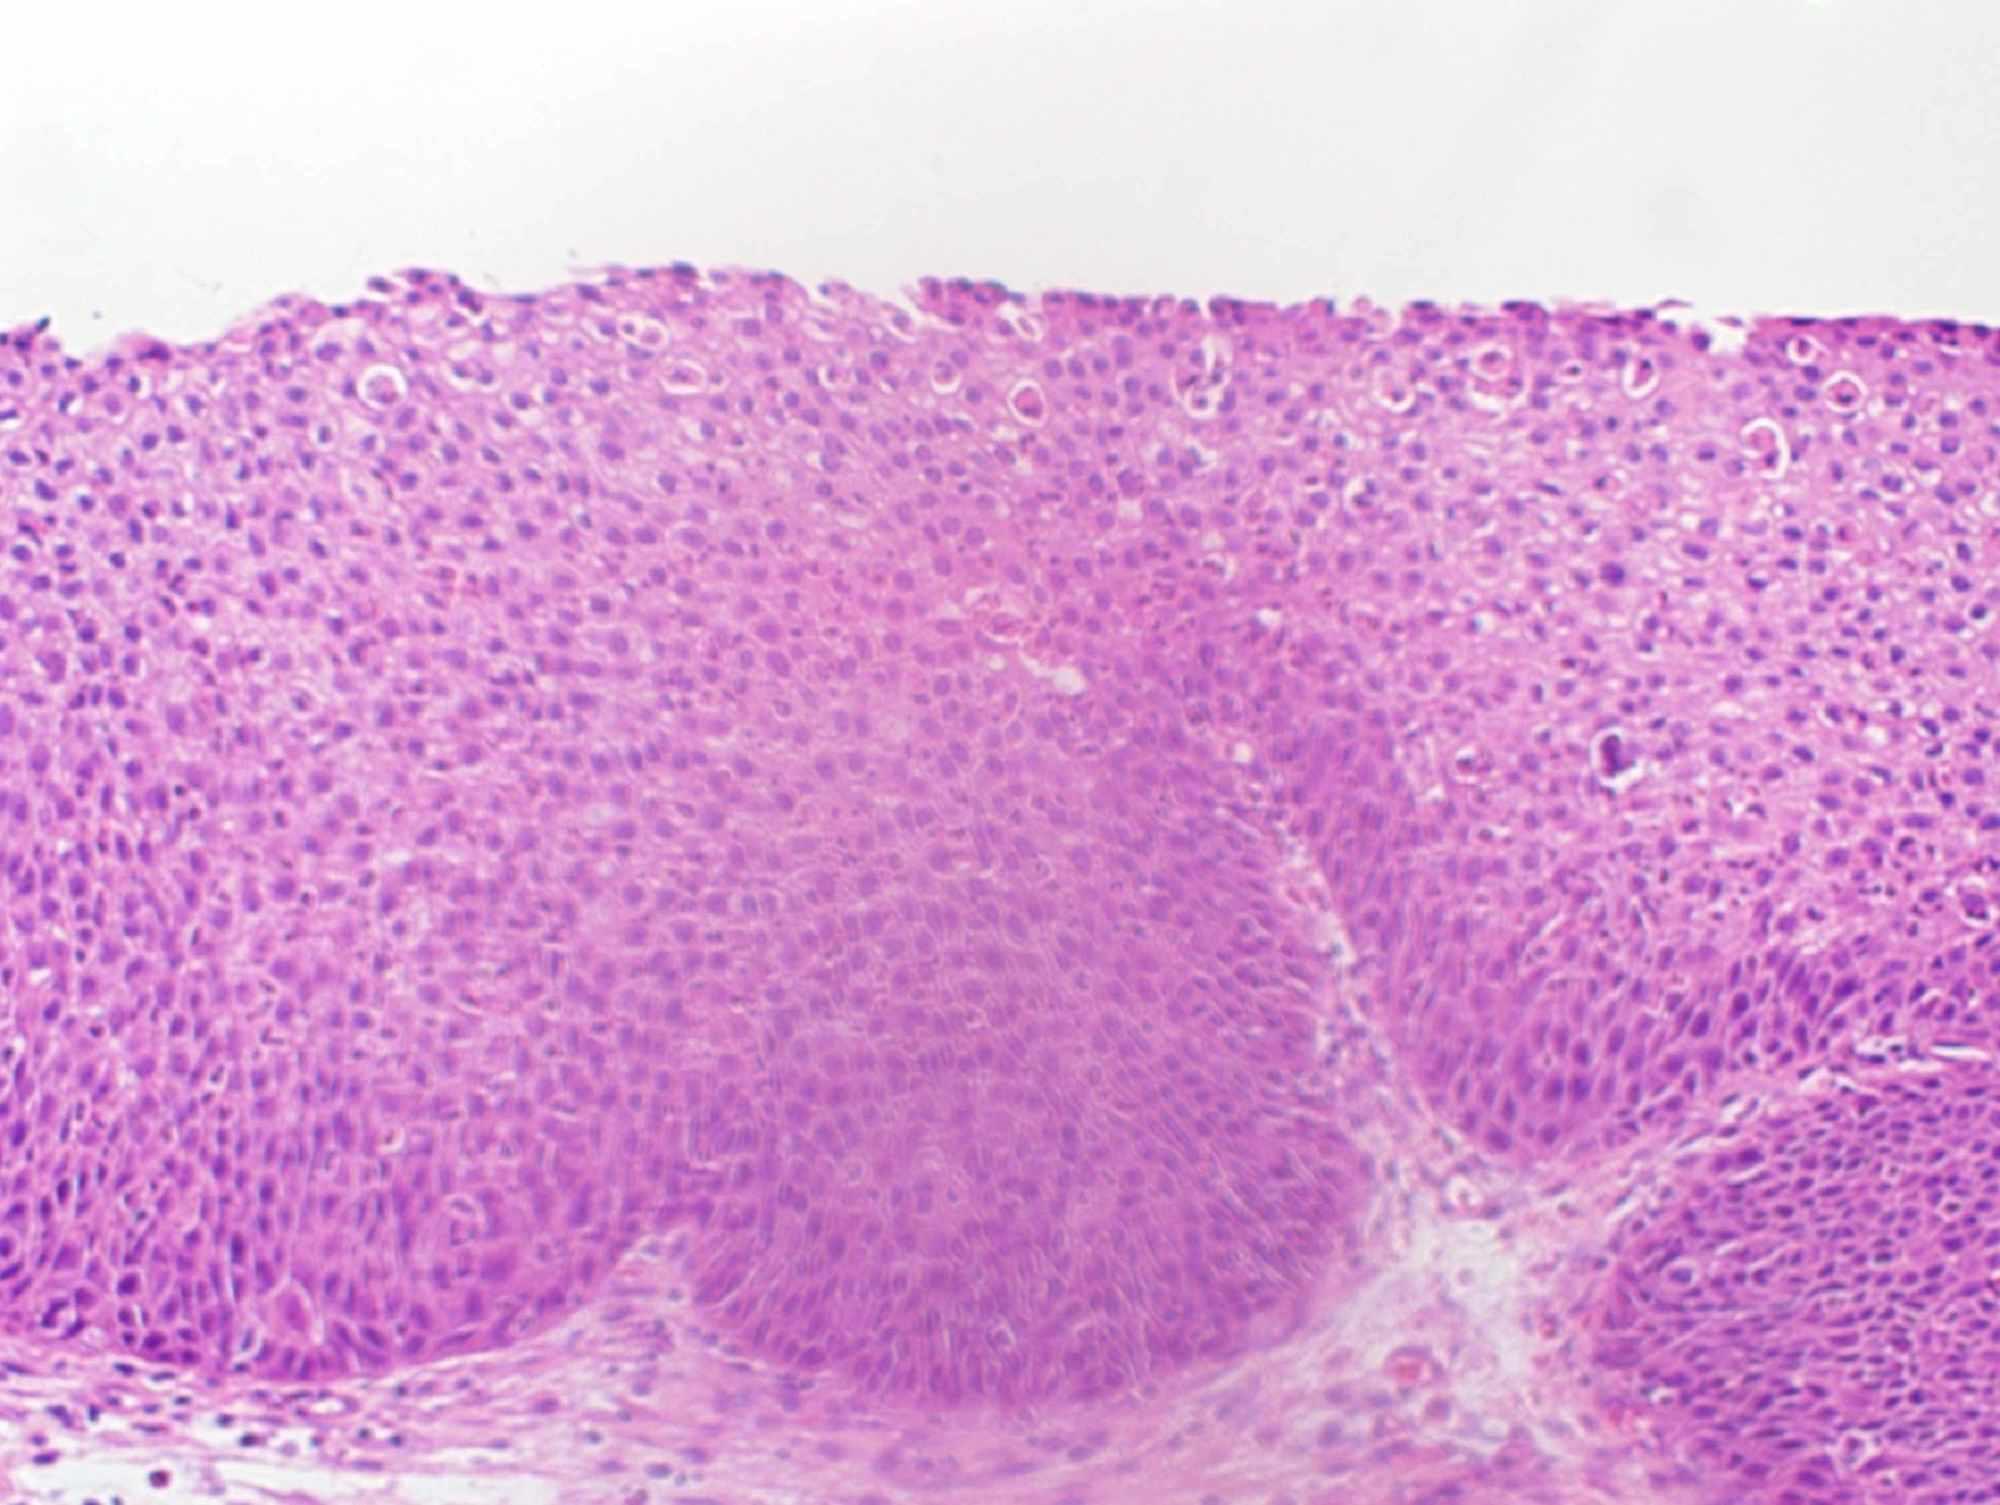 treatment for sinonasal inverted papilloma